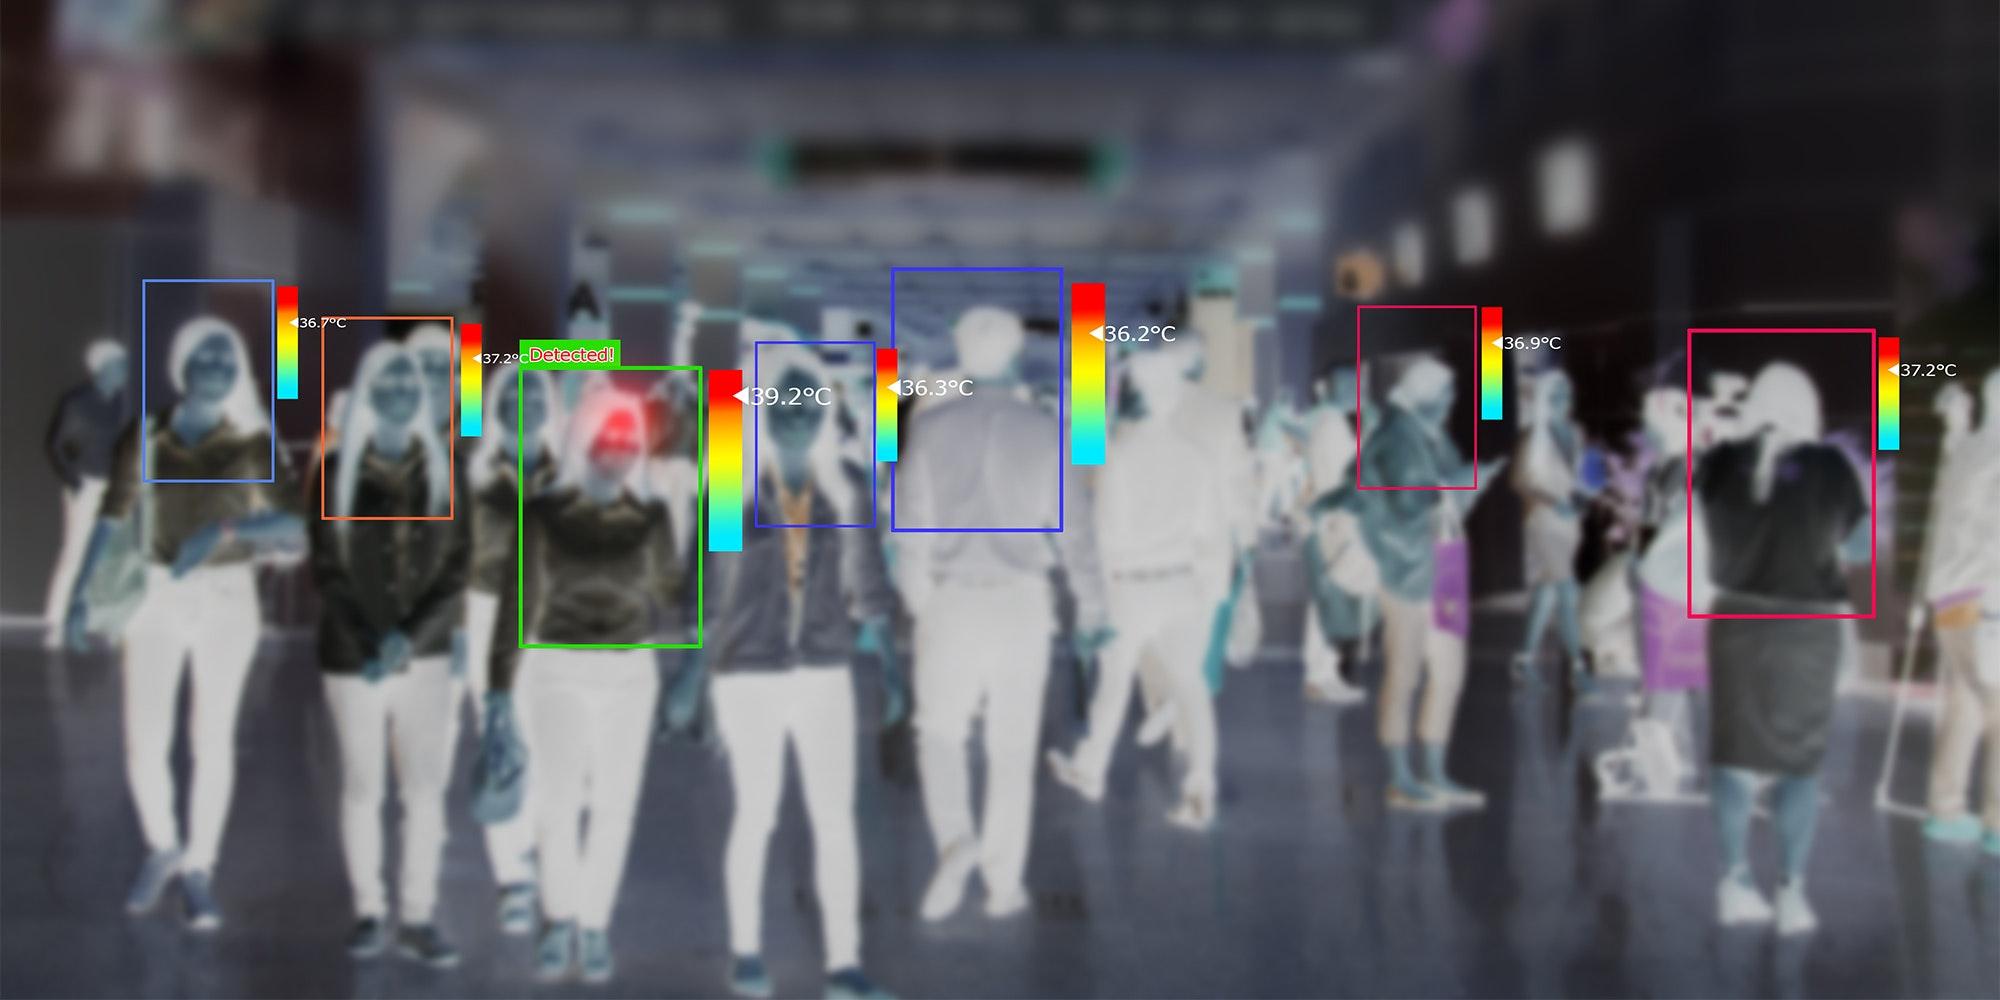 thermal camera facial recognition jpg?fm=pjpg&ixlib=php 3 3 0.